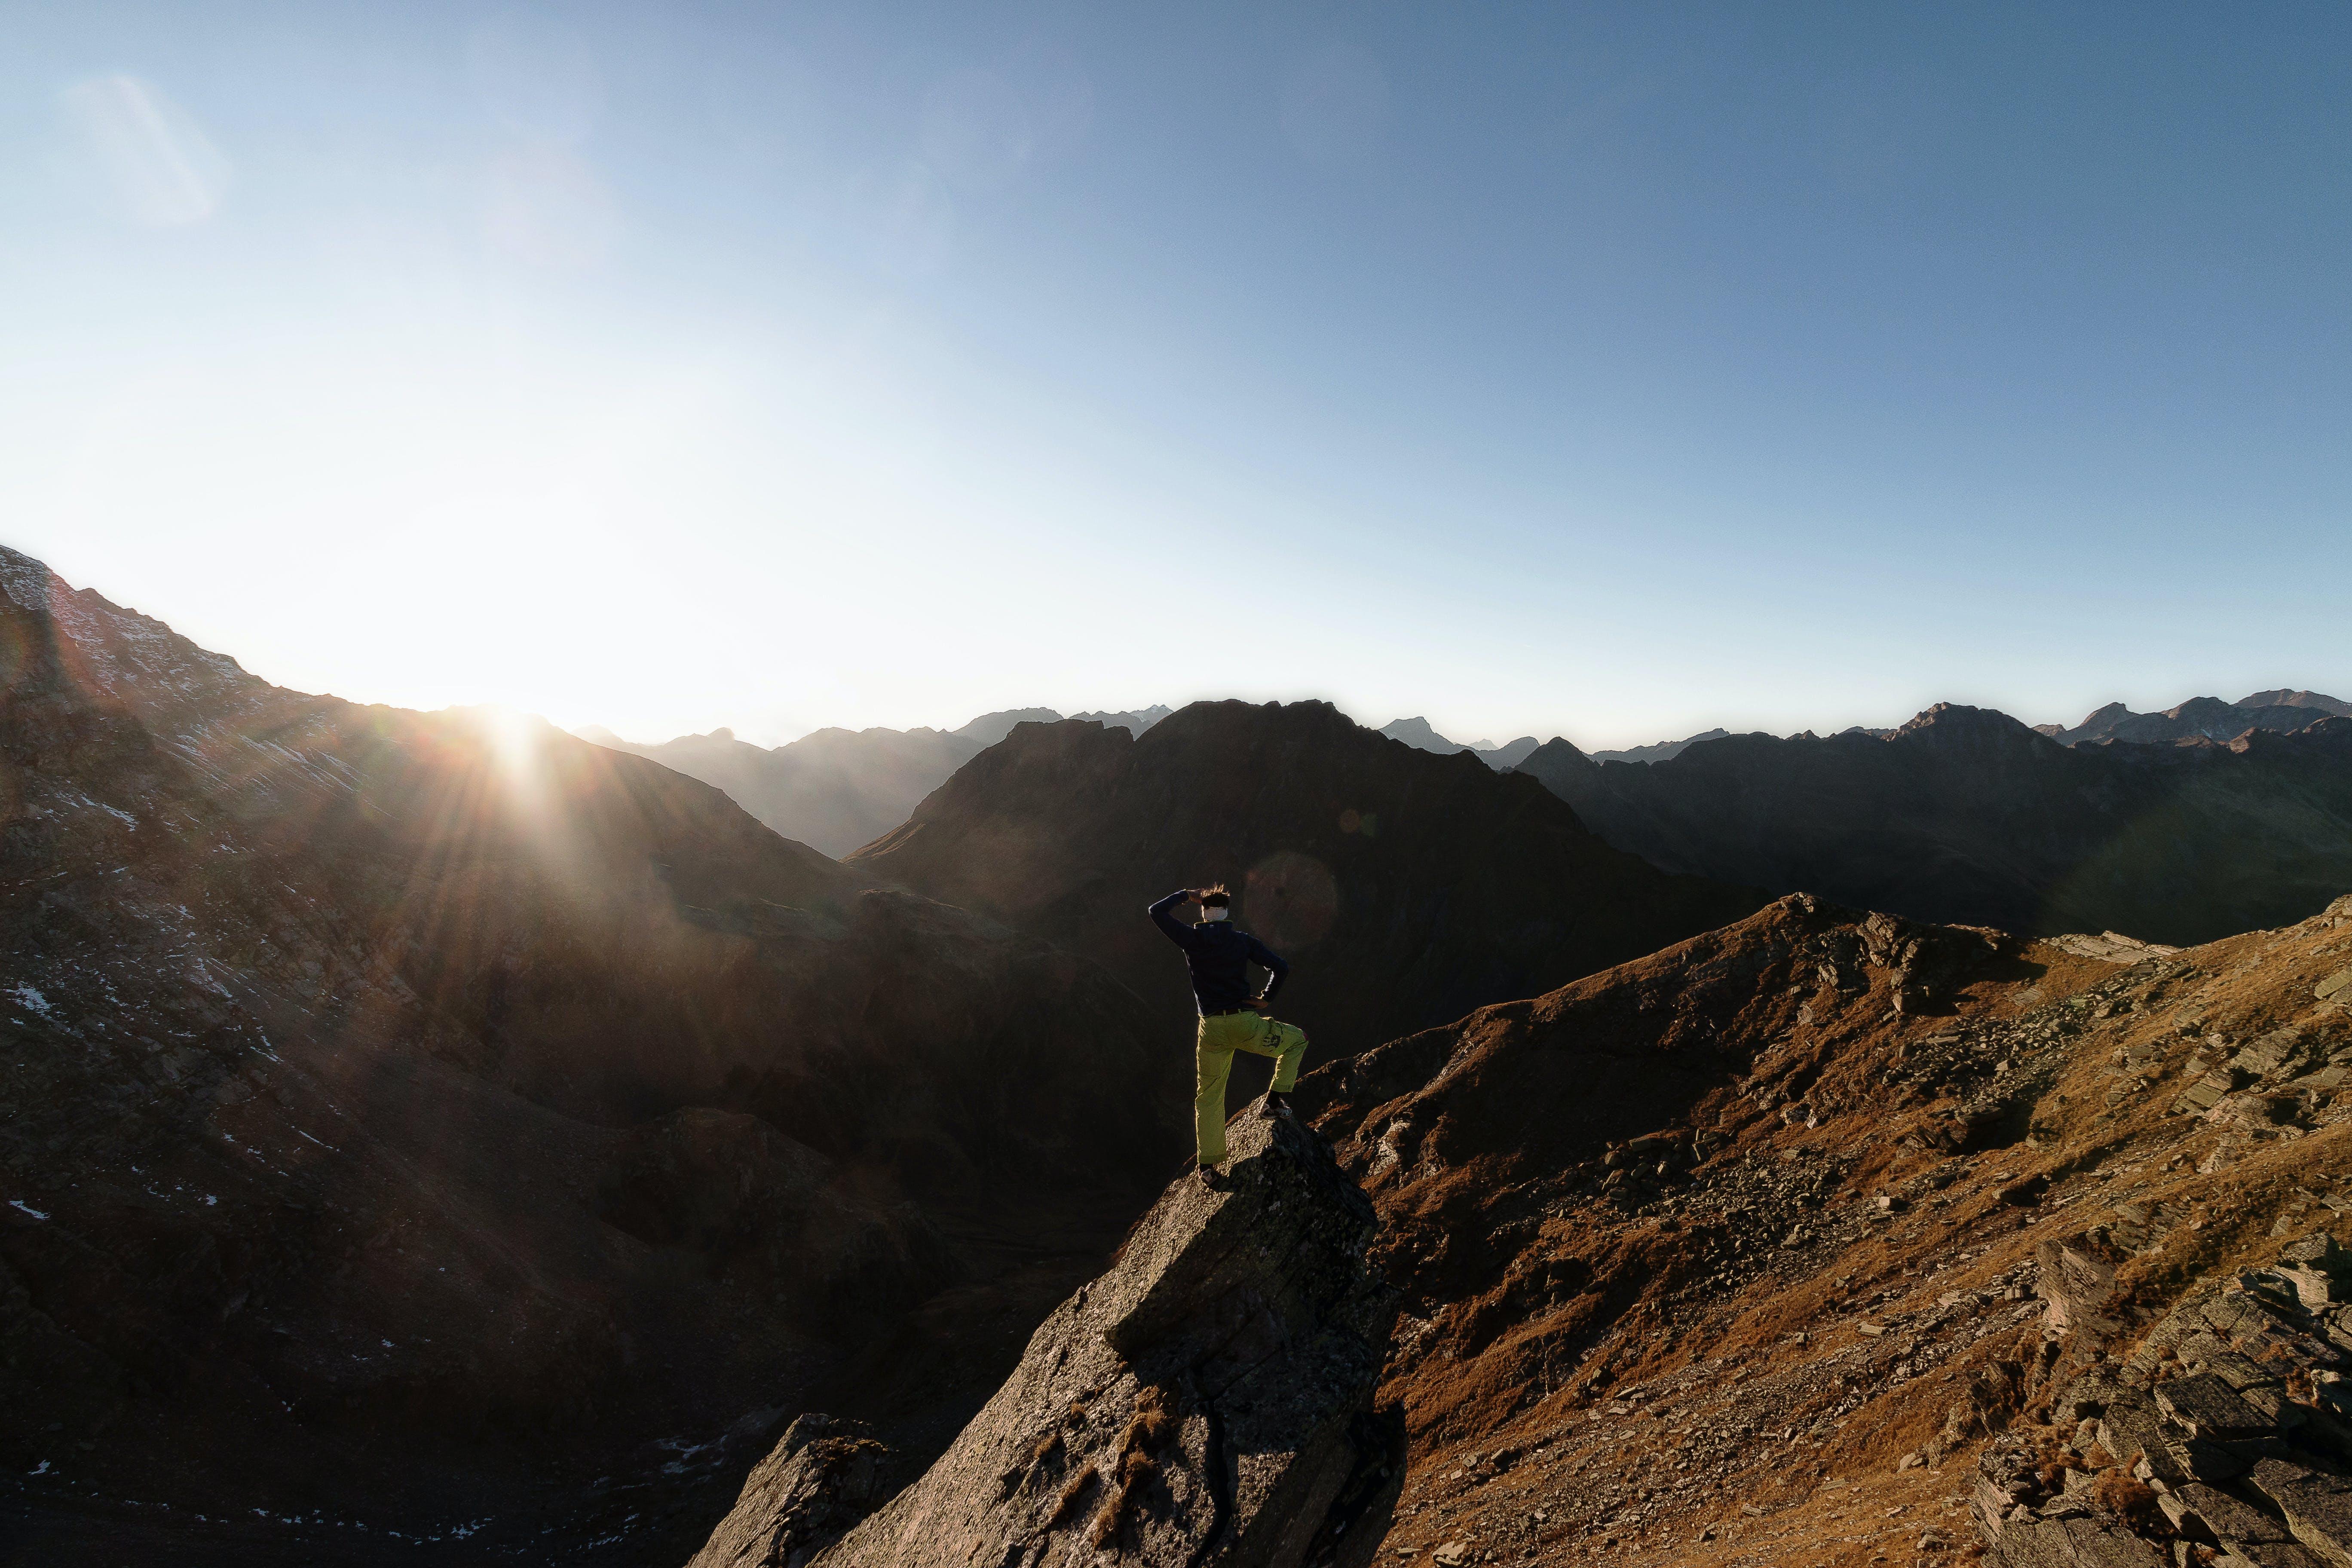 Man Standing on Rock on Top of Mountain Facing Sun